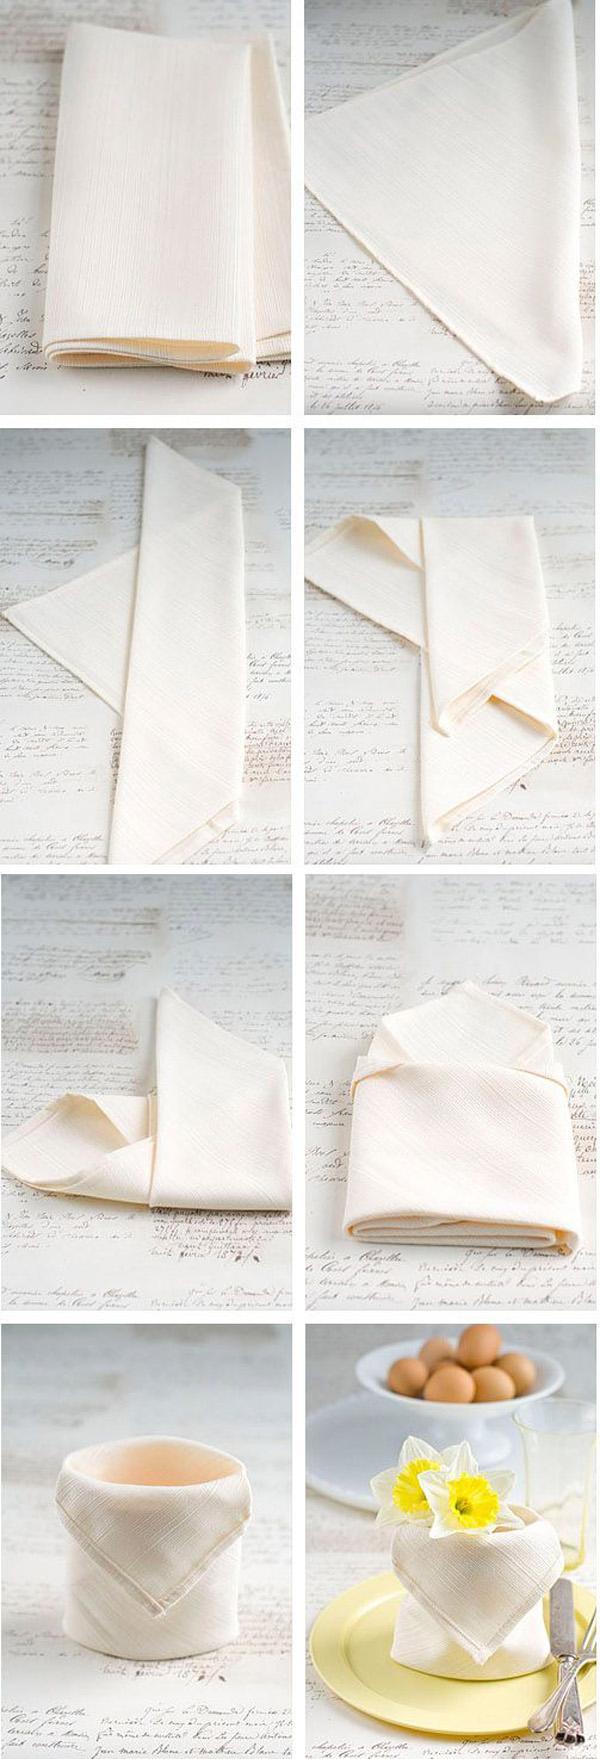 Napkin Fold-11